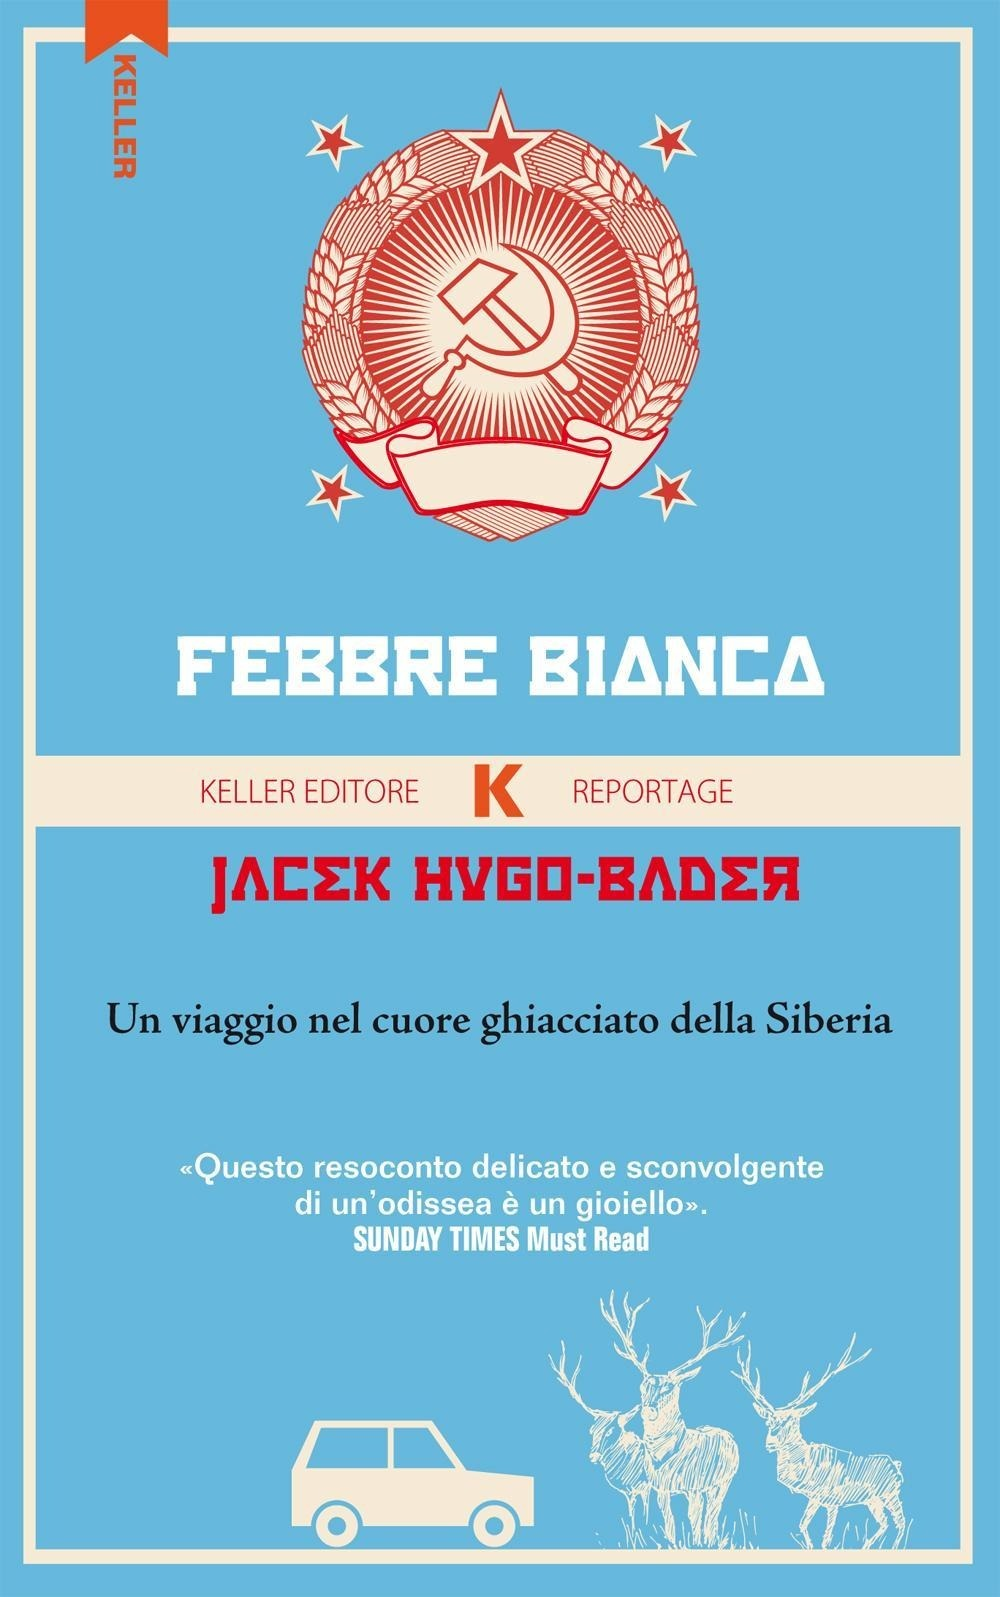 Recensione di Febbre Bianca – J. Hugo-Bader